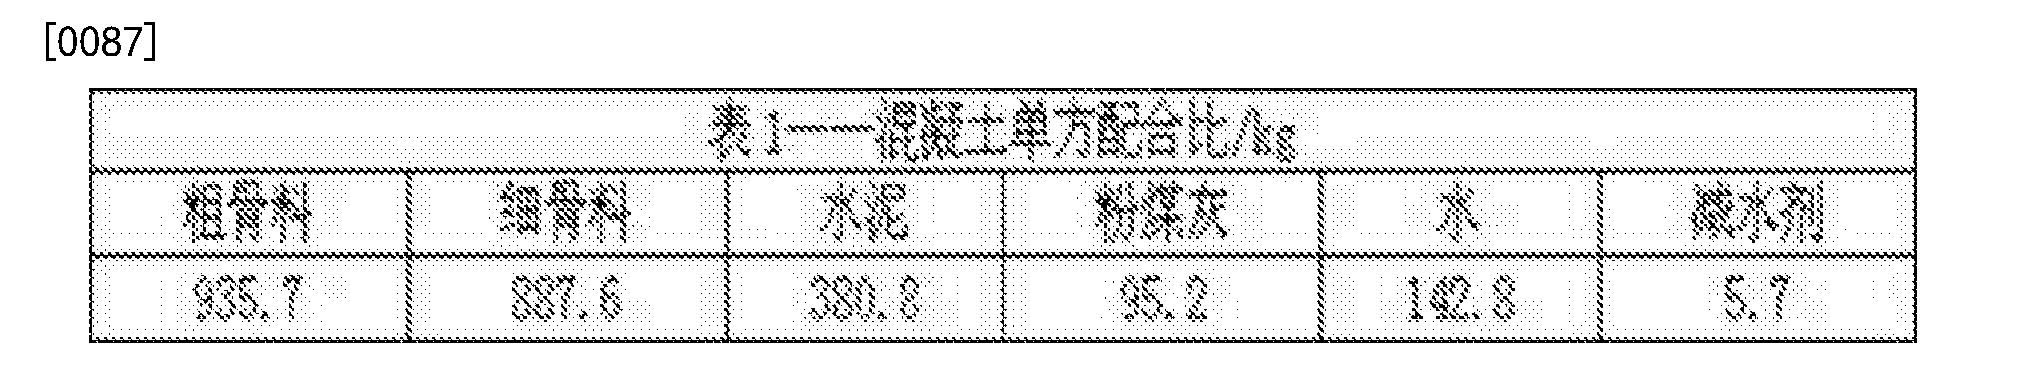 Figure CN206002361UD00131